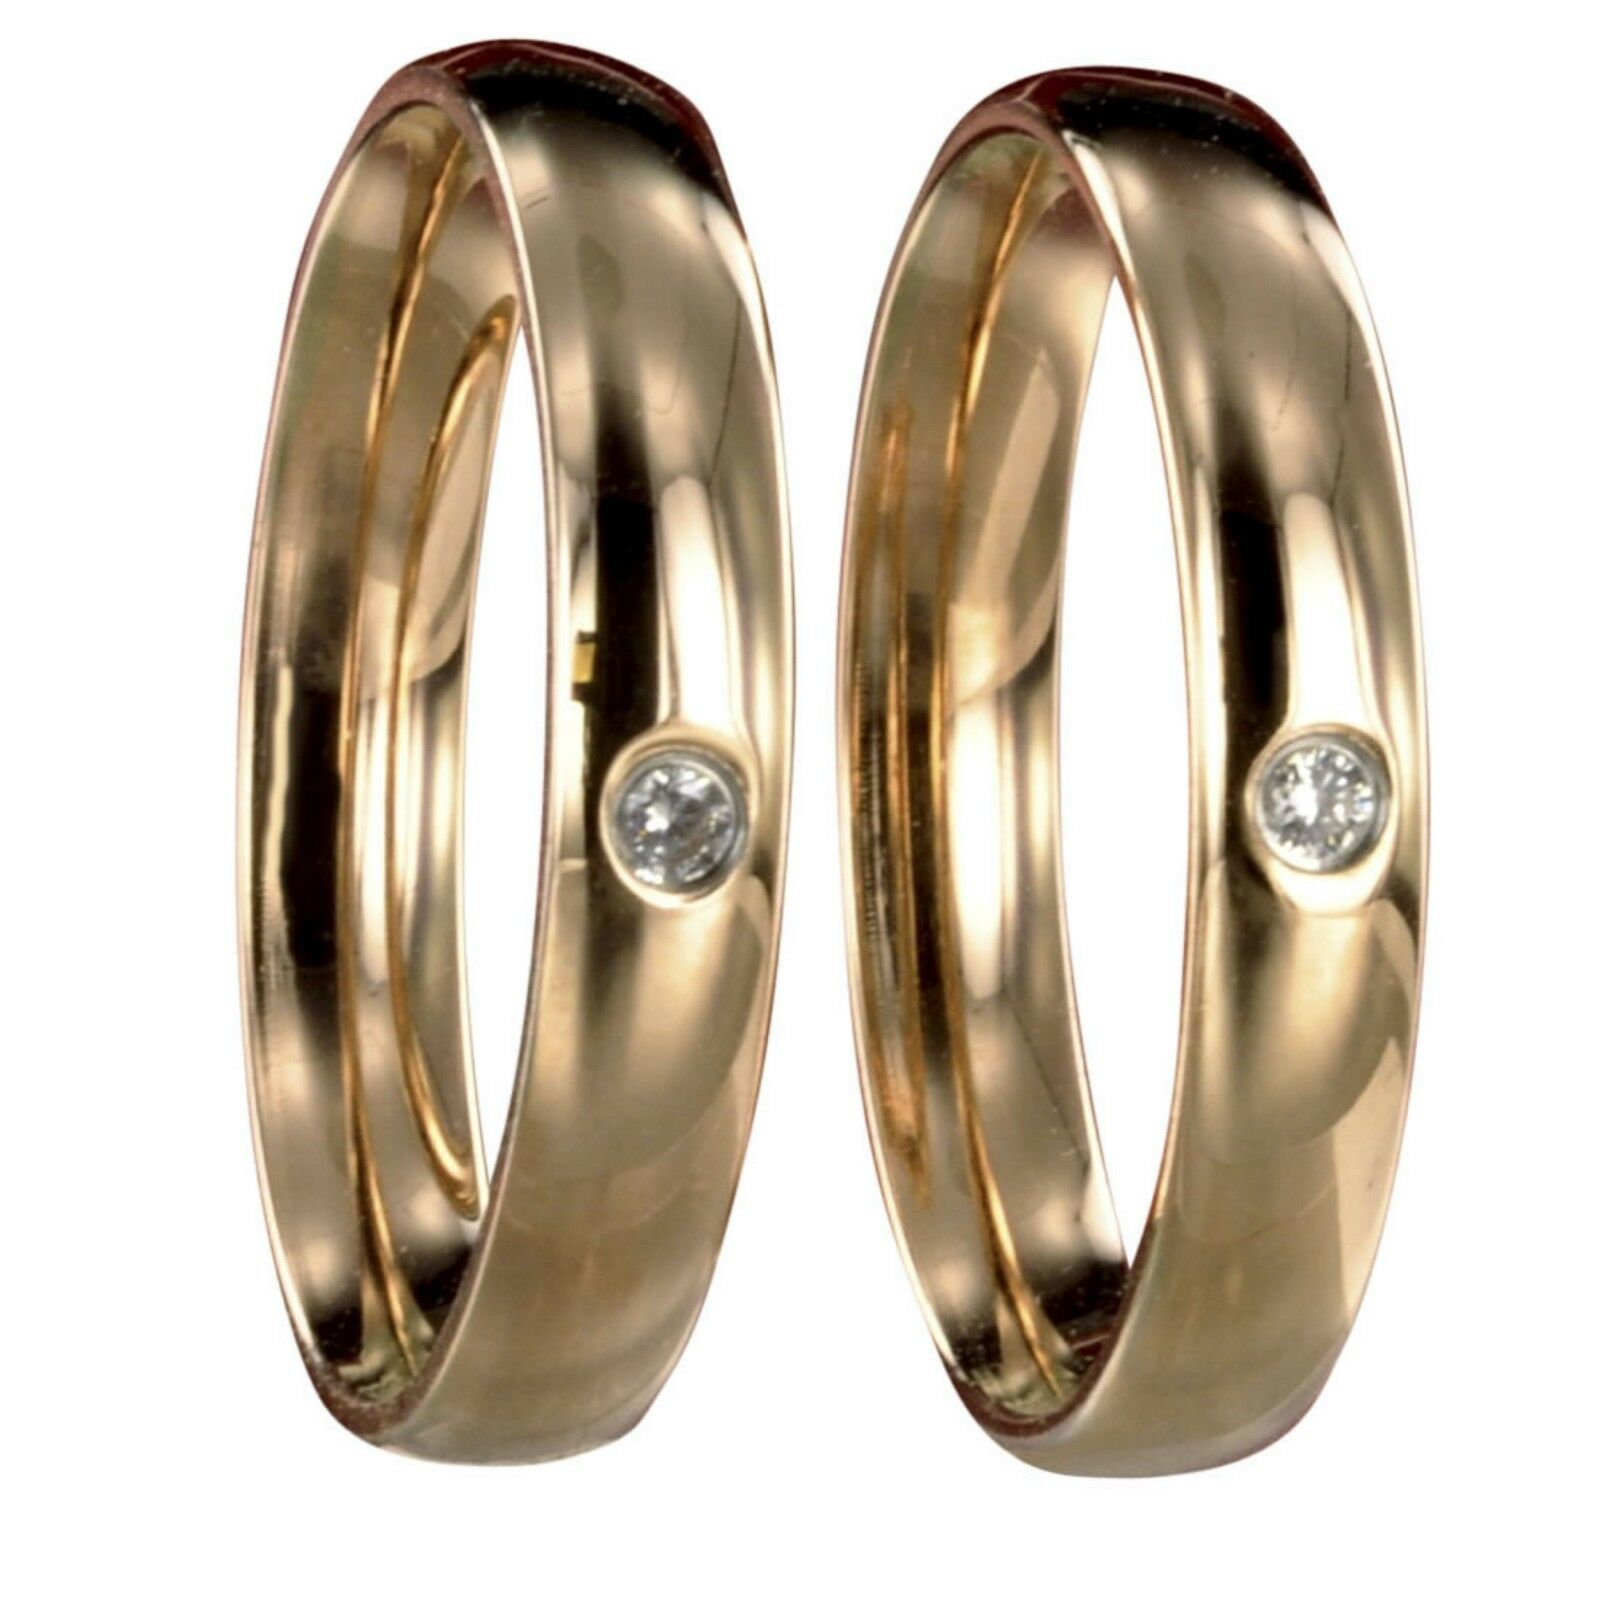 2 Edelstahl pinkgold Freundschaftsringe Verlobungsringe mit Innengravur 50032